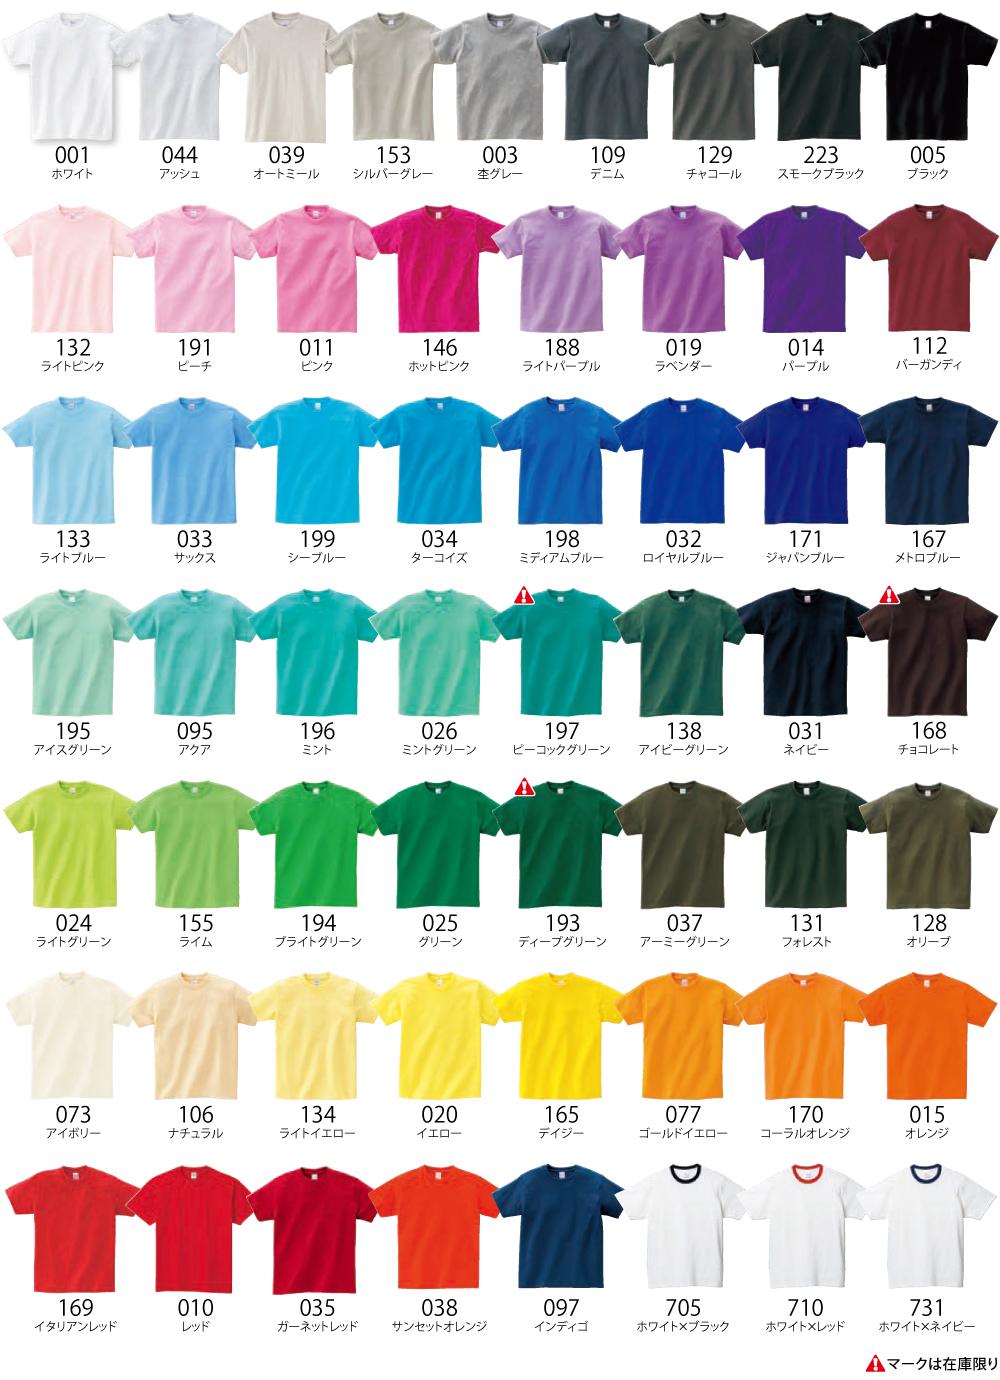 【085-CVT】 5.6オンス ヘビーウェイトTシャツ